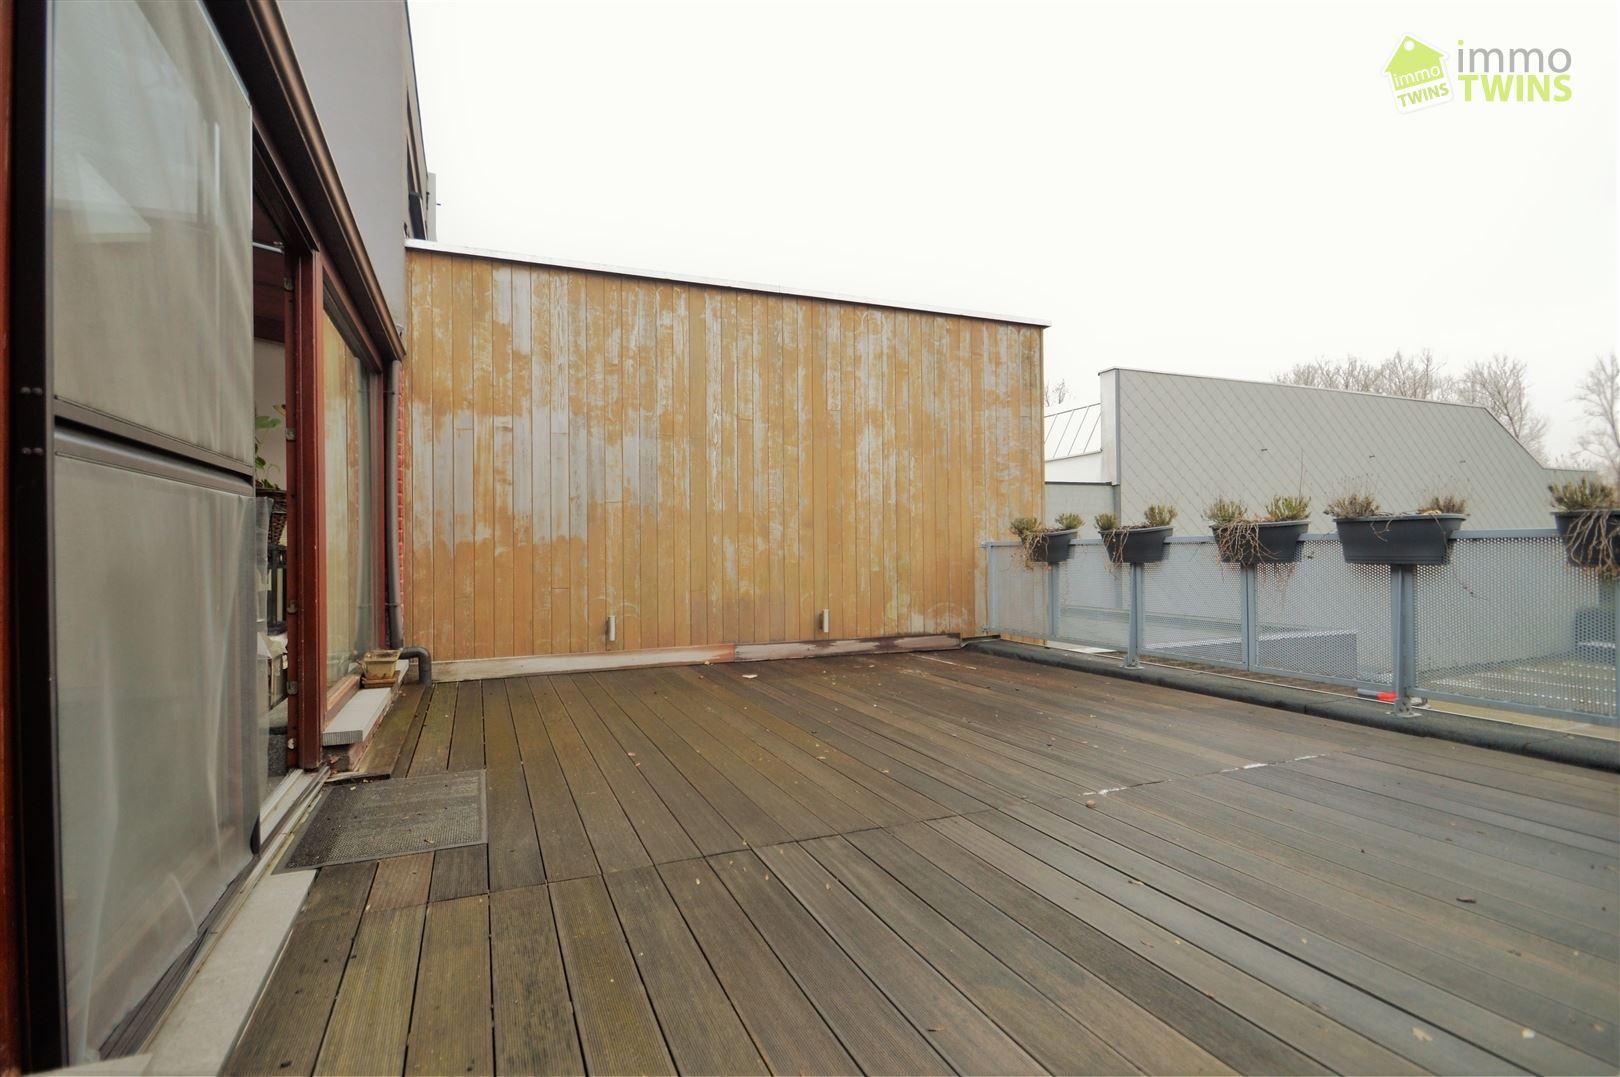 Foto 9 : Duplex/Penthouse te 2890 SINT-AMANDS (België) - Prijs € 449.000